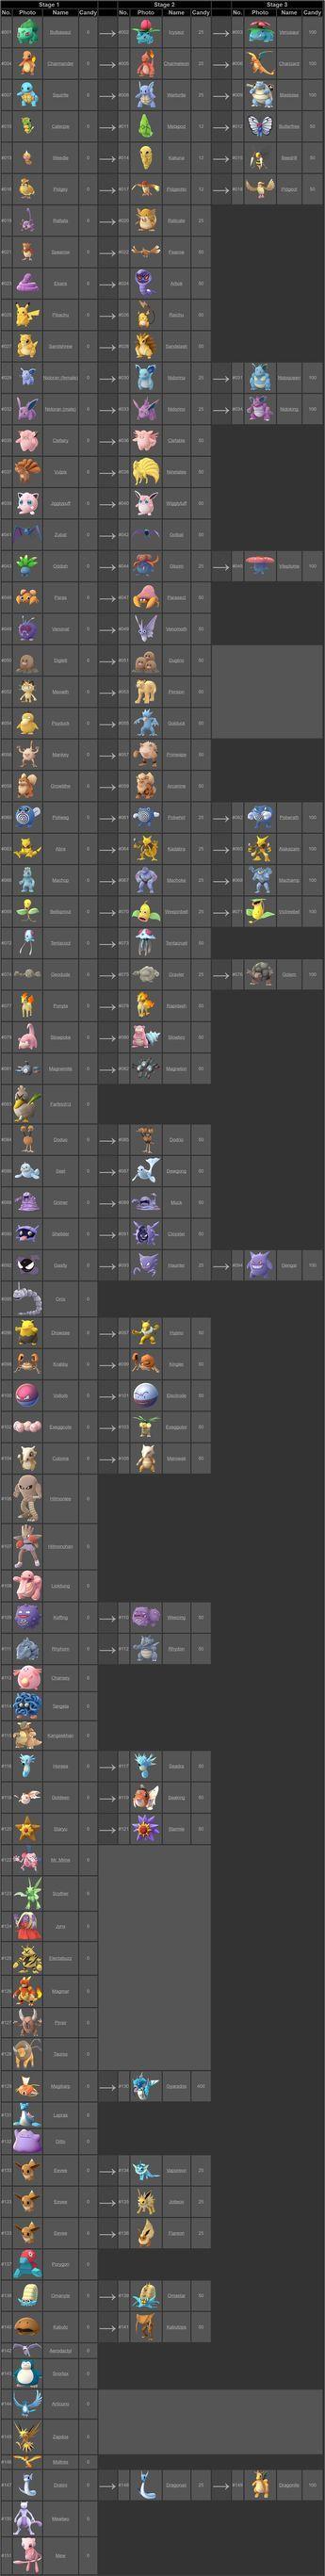 Pokémon Go Evolution Chart